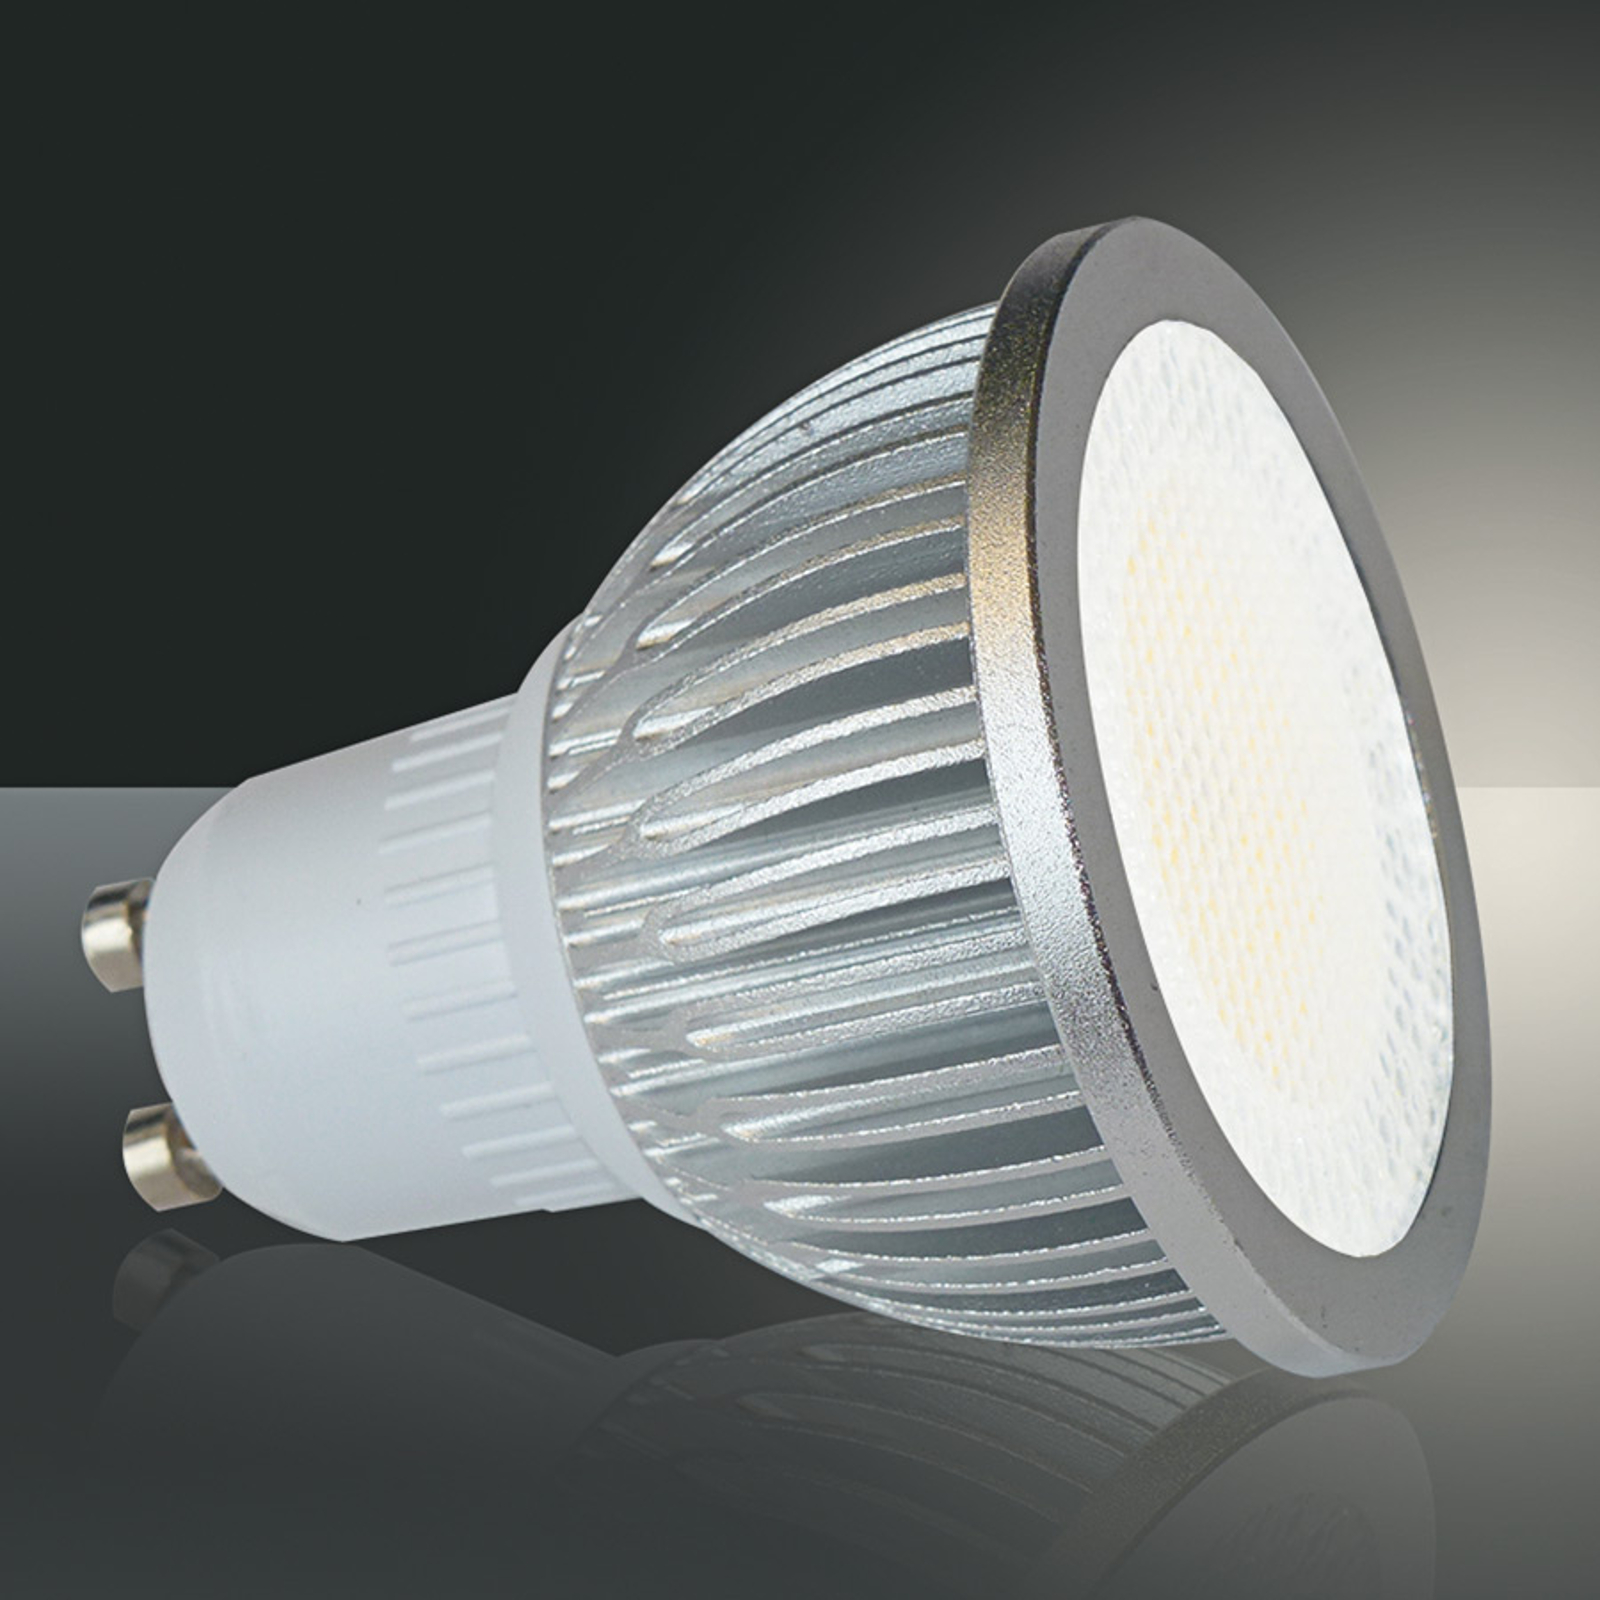 GU10 5W 829 højvolts LED reflektorpære, 90°